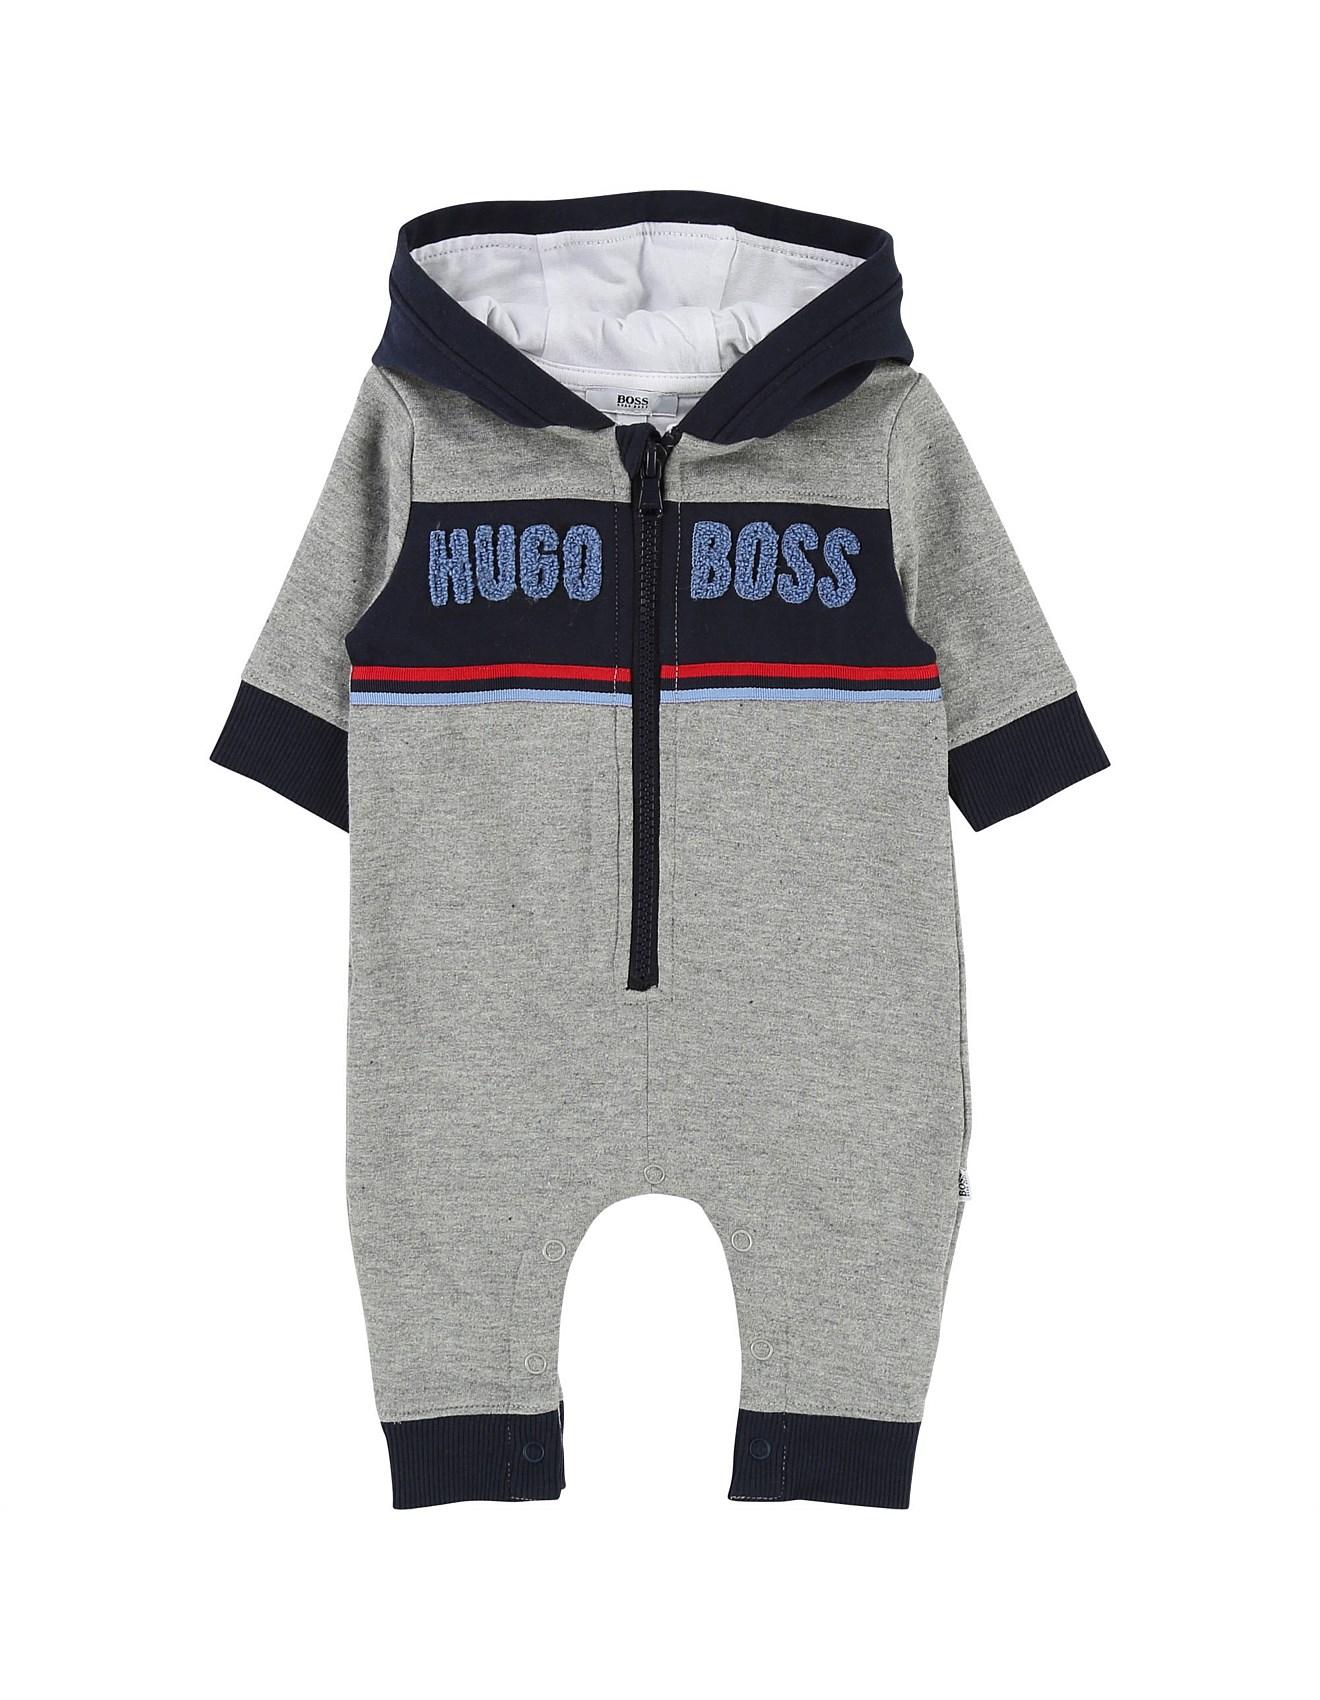 hugo boss baby boy